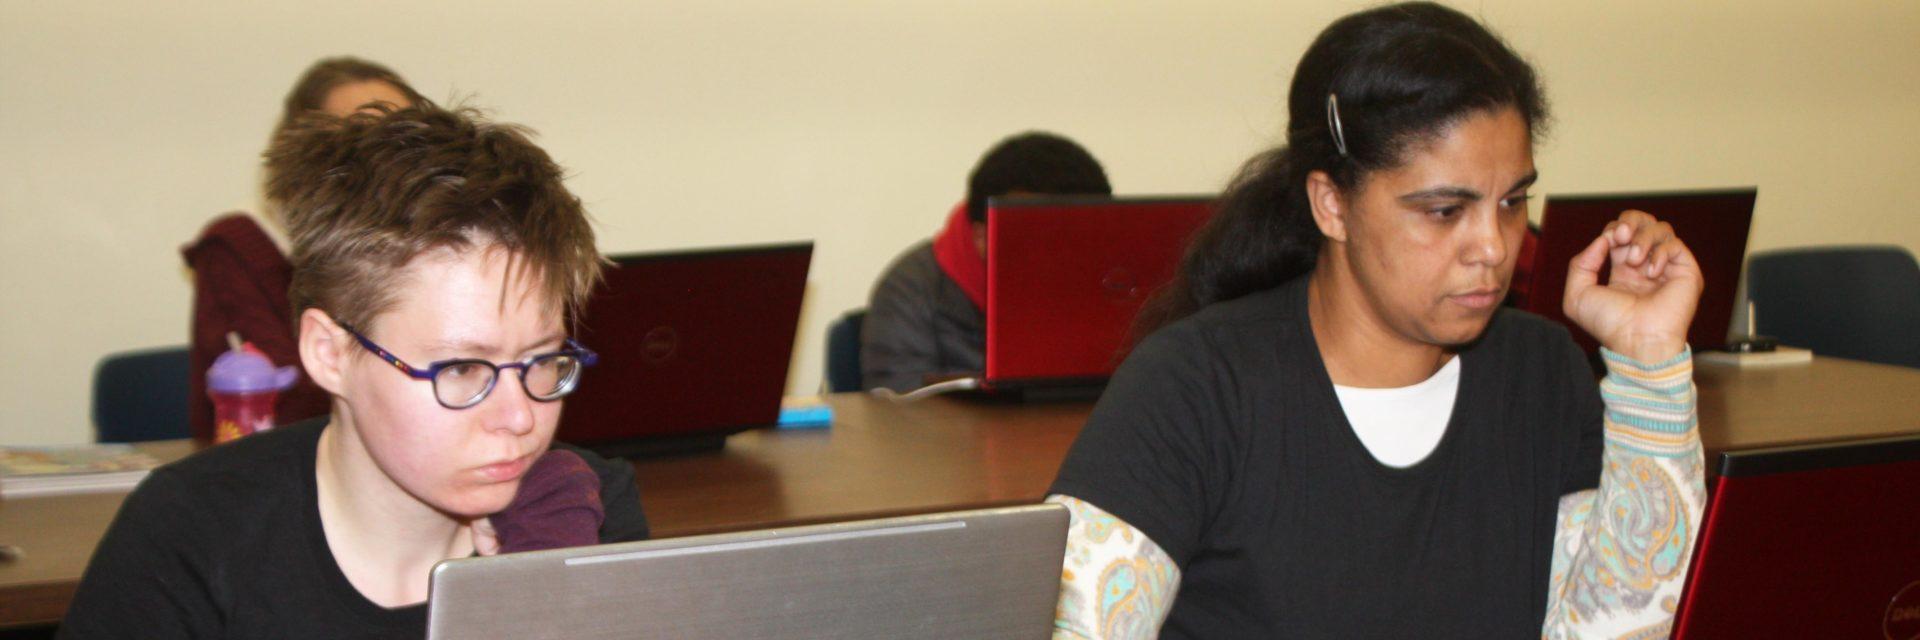 Adults in PPL Rhode Coders class.